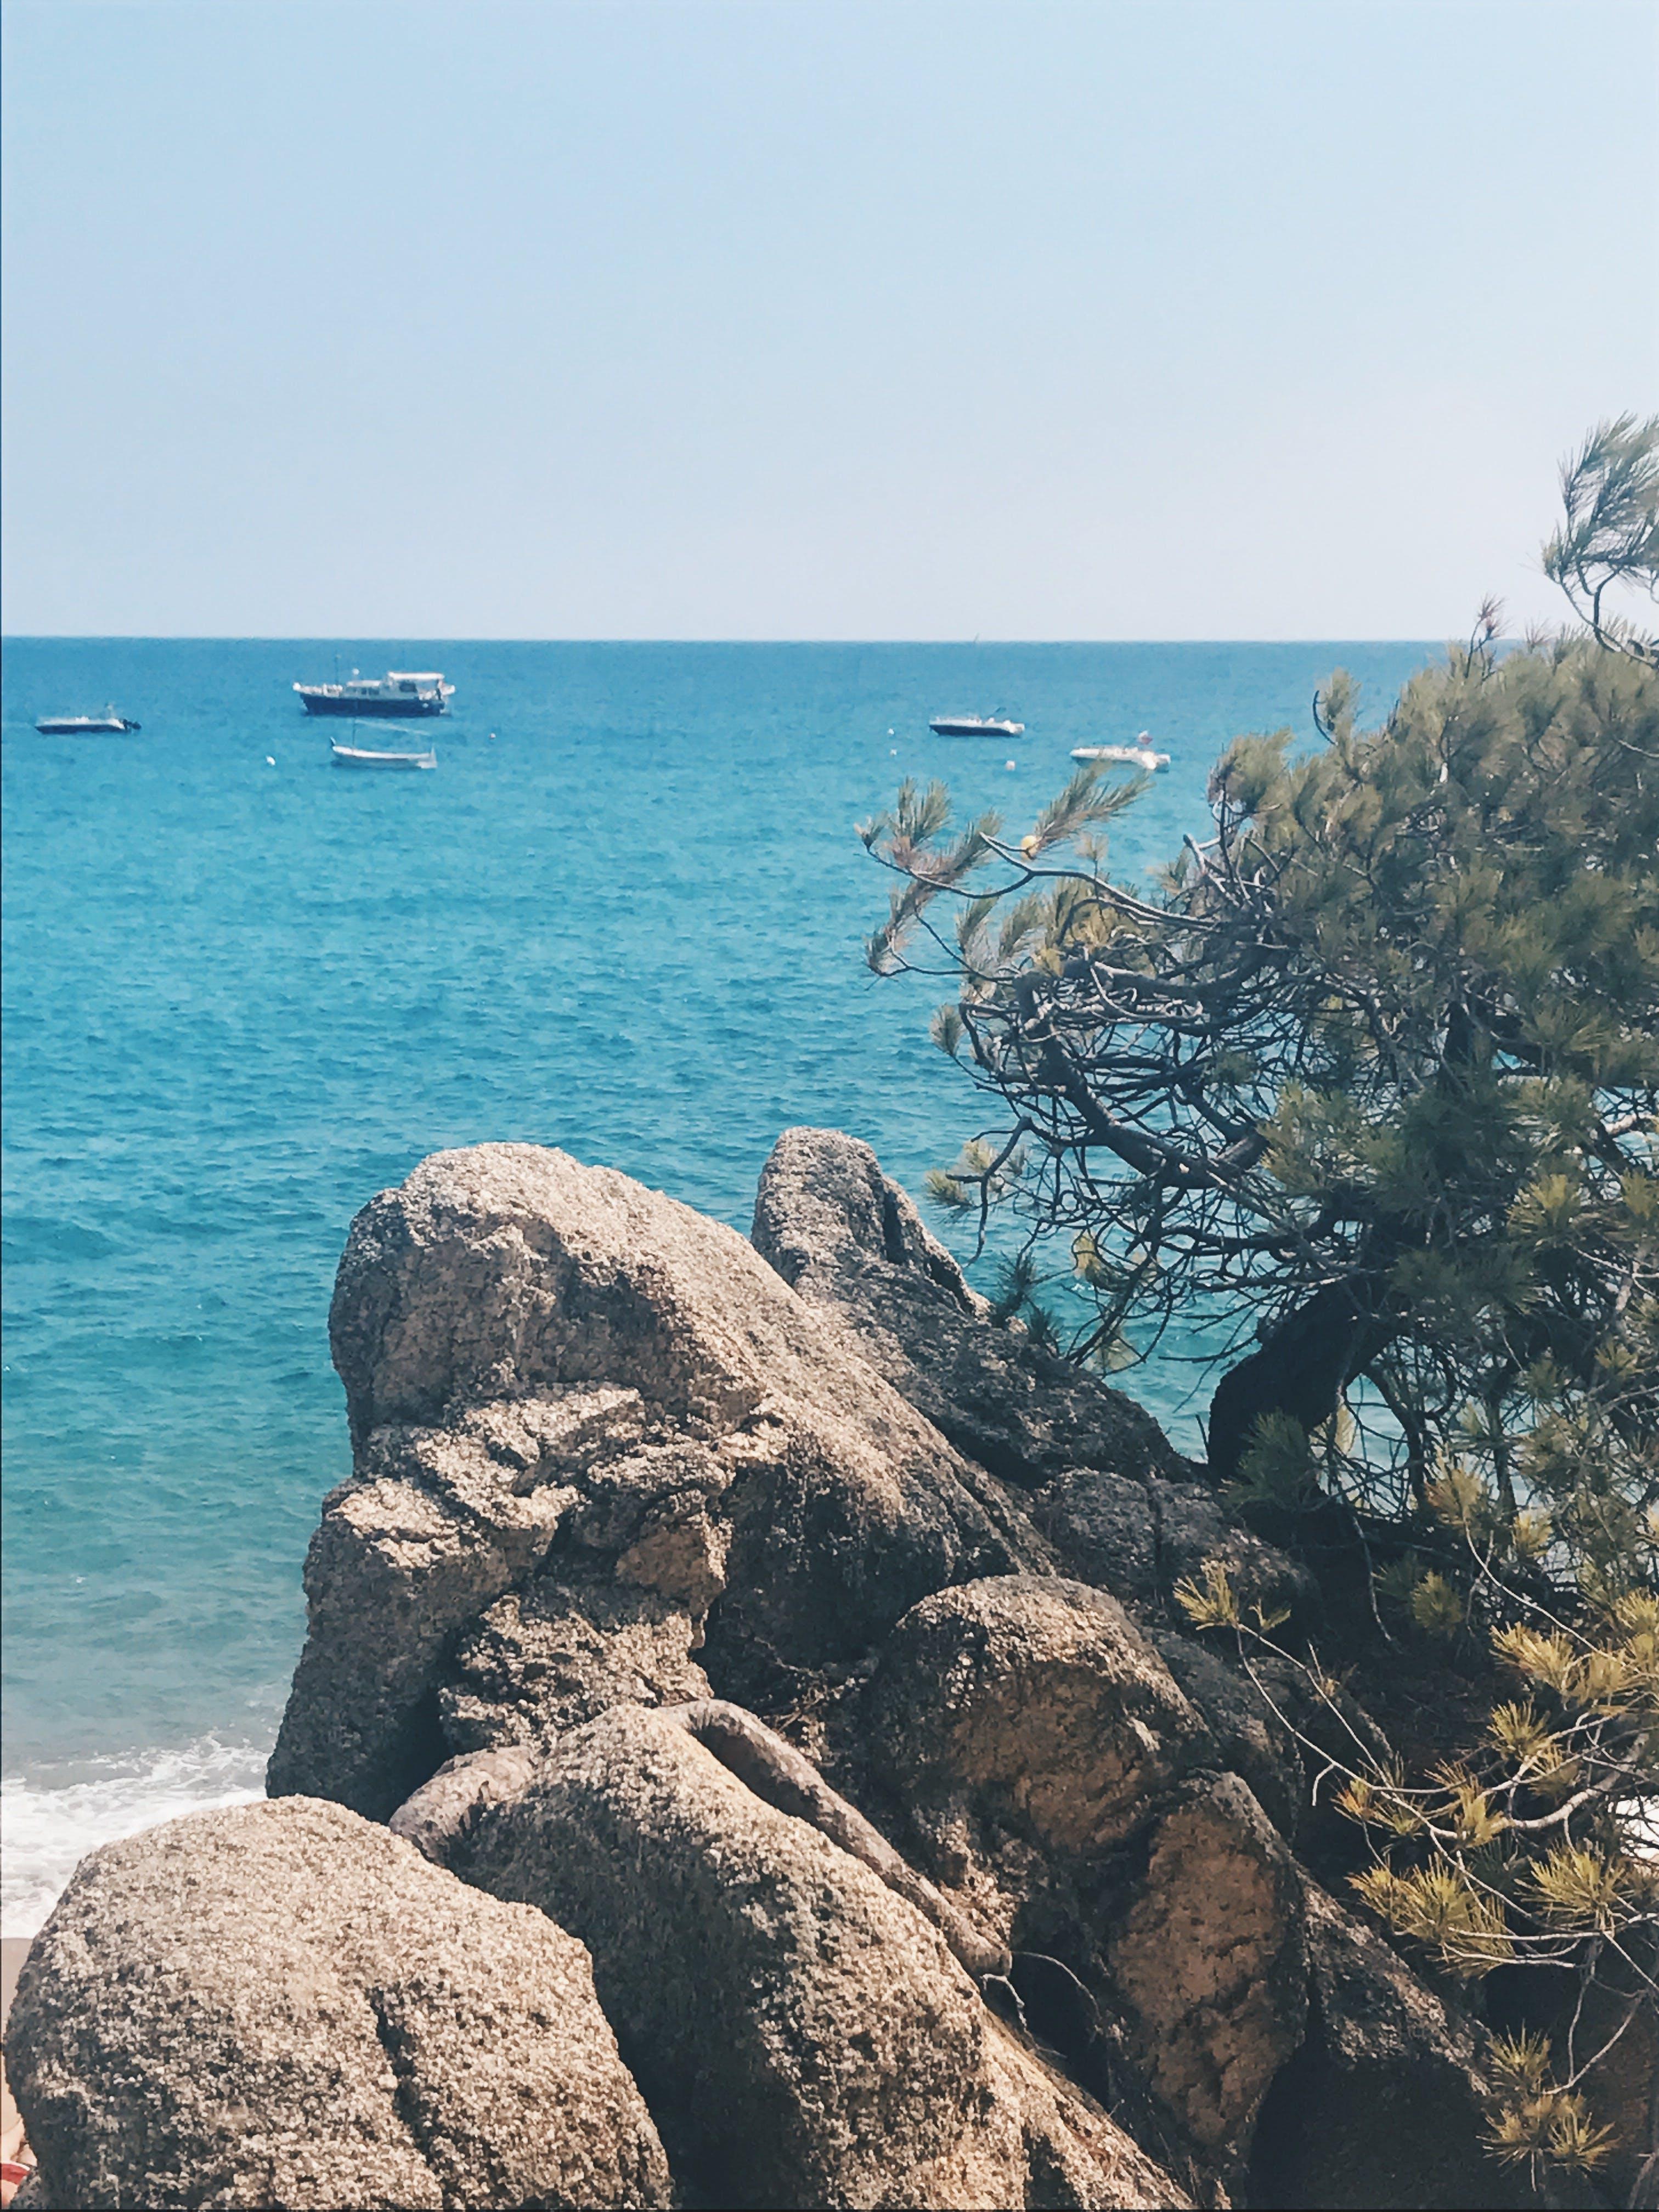 Free stock photo of mediterranean sea, rocks, sea life, sunny day